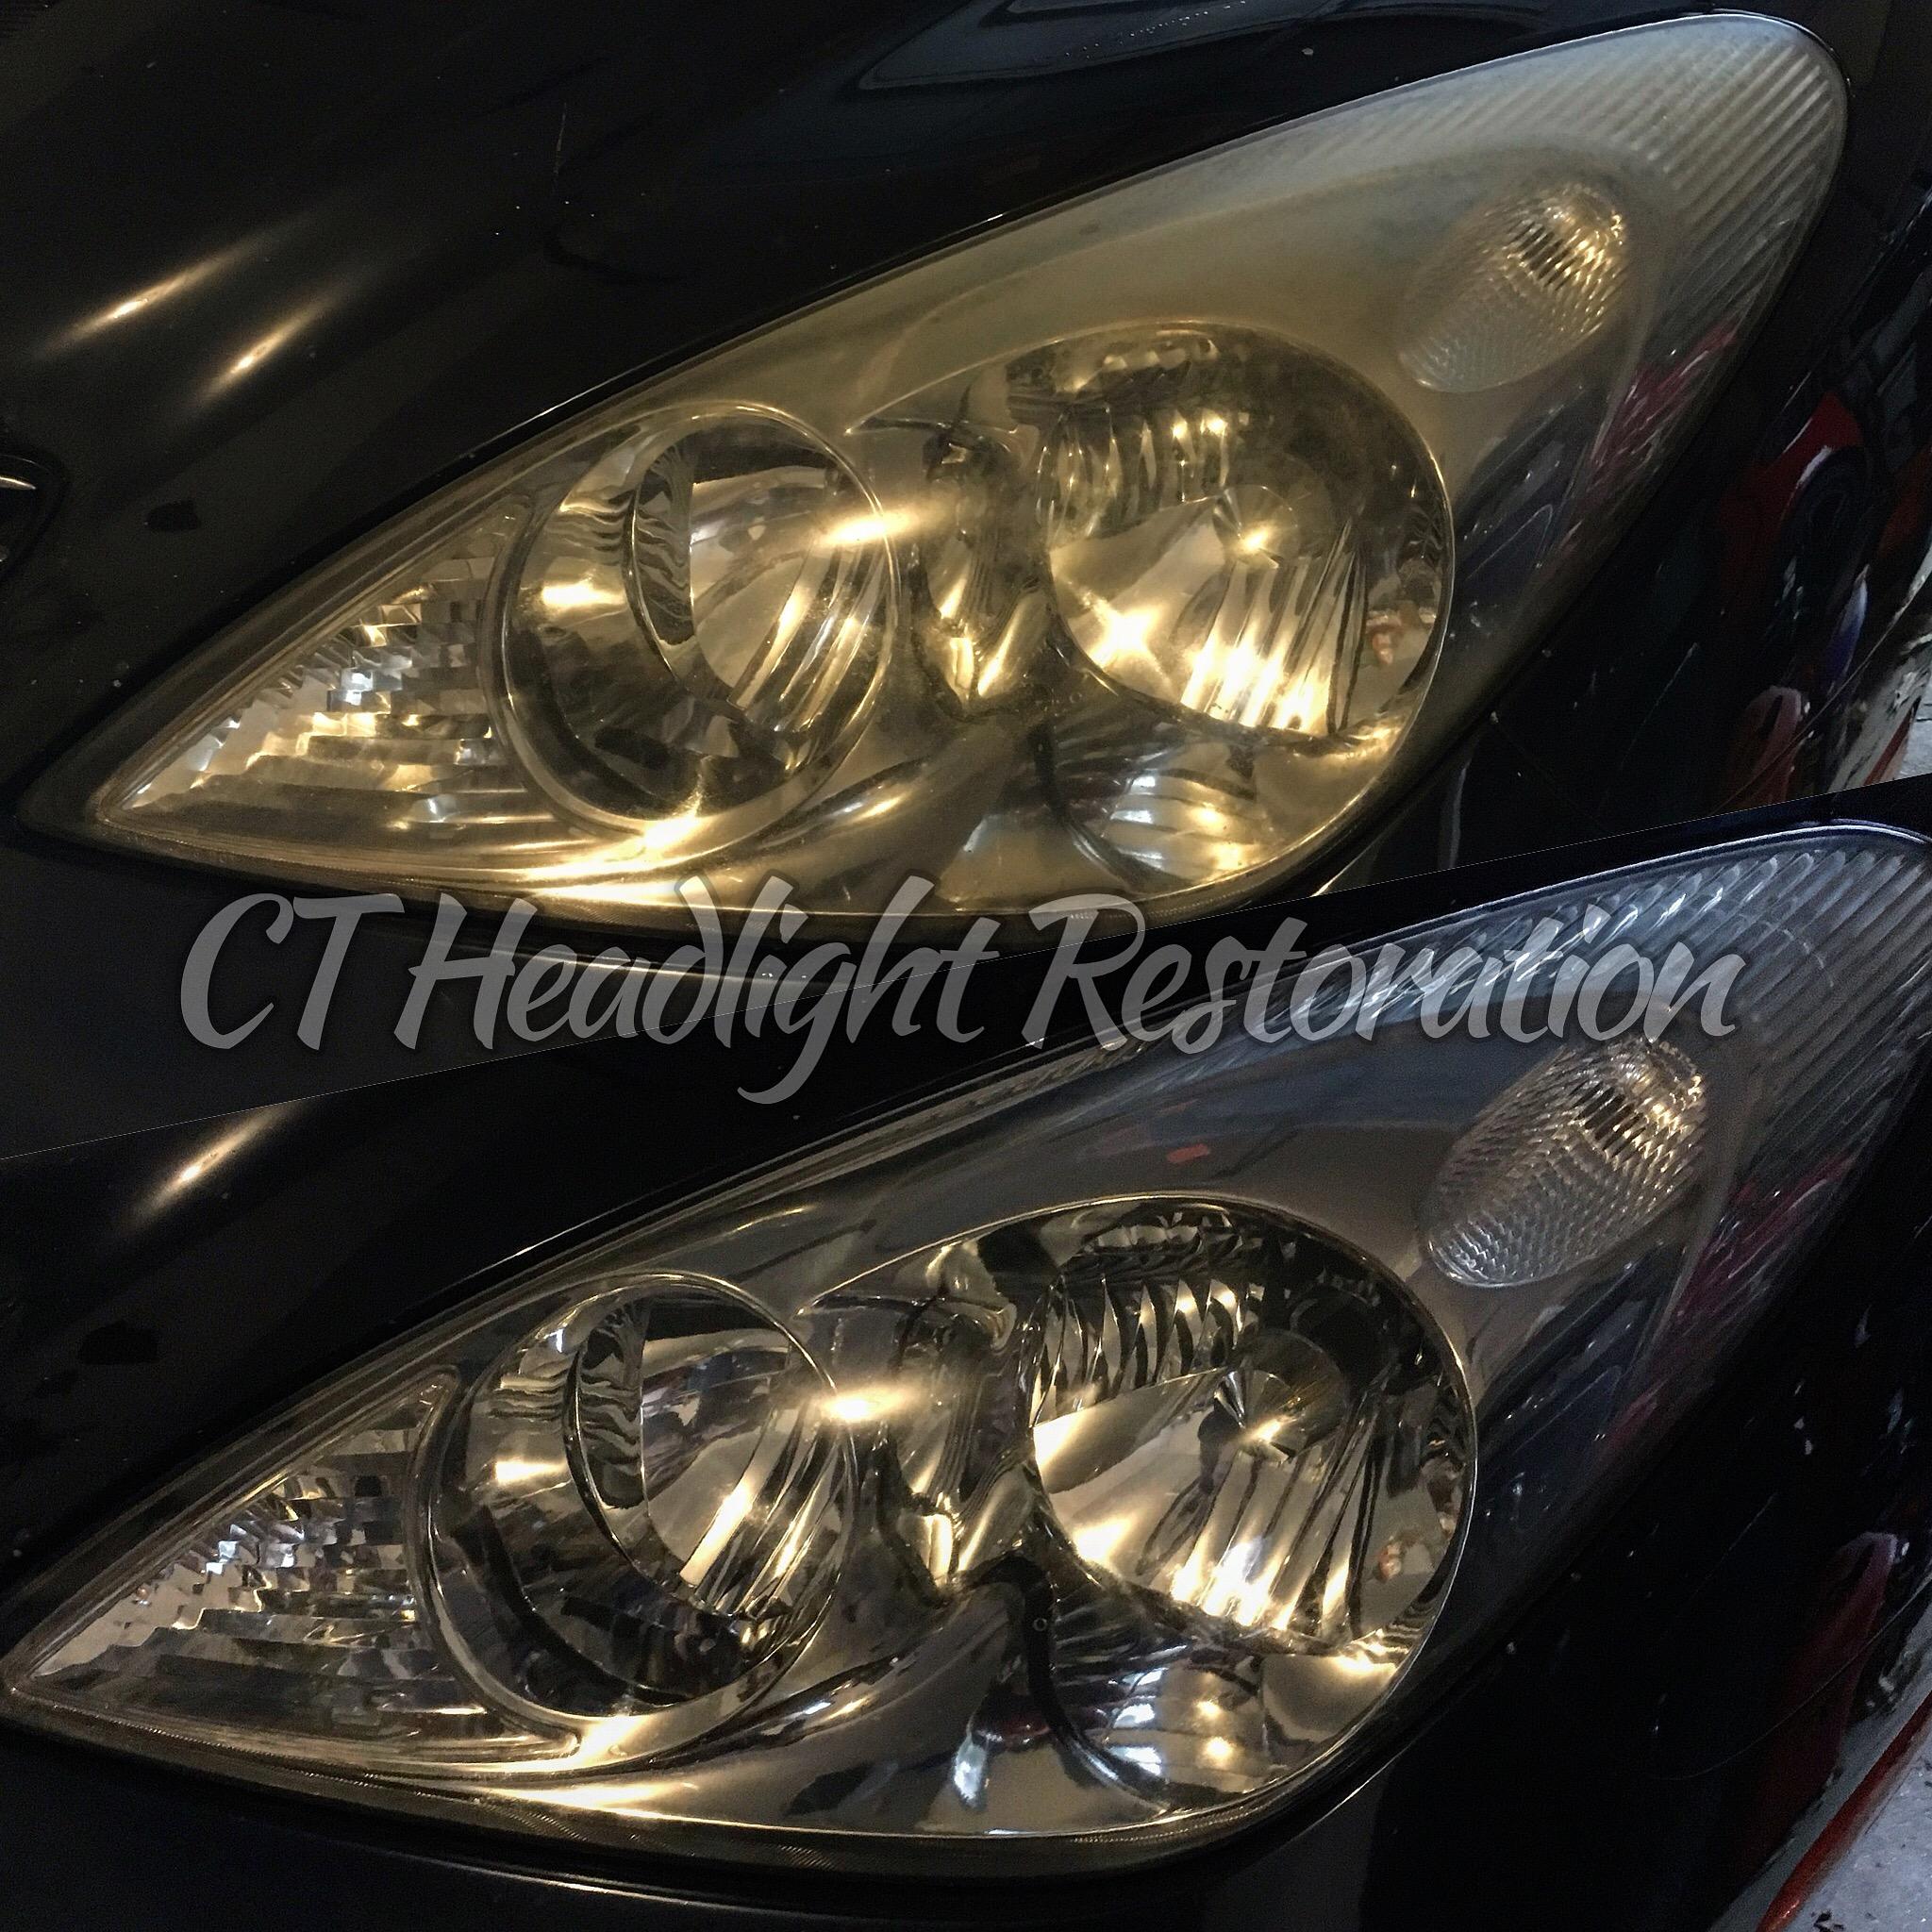 CT Headlight Restoration Lexus ES.JPG